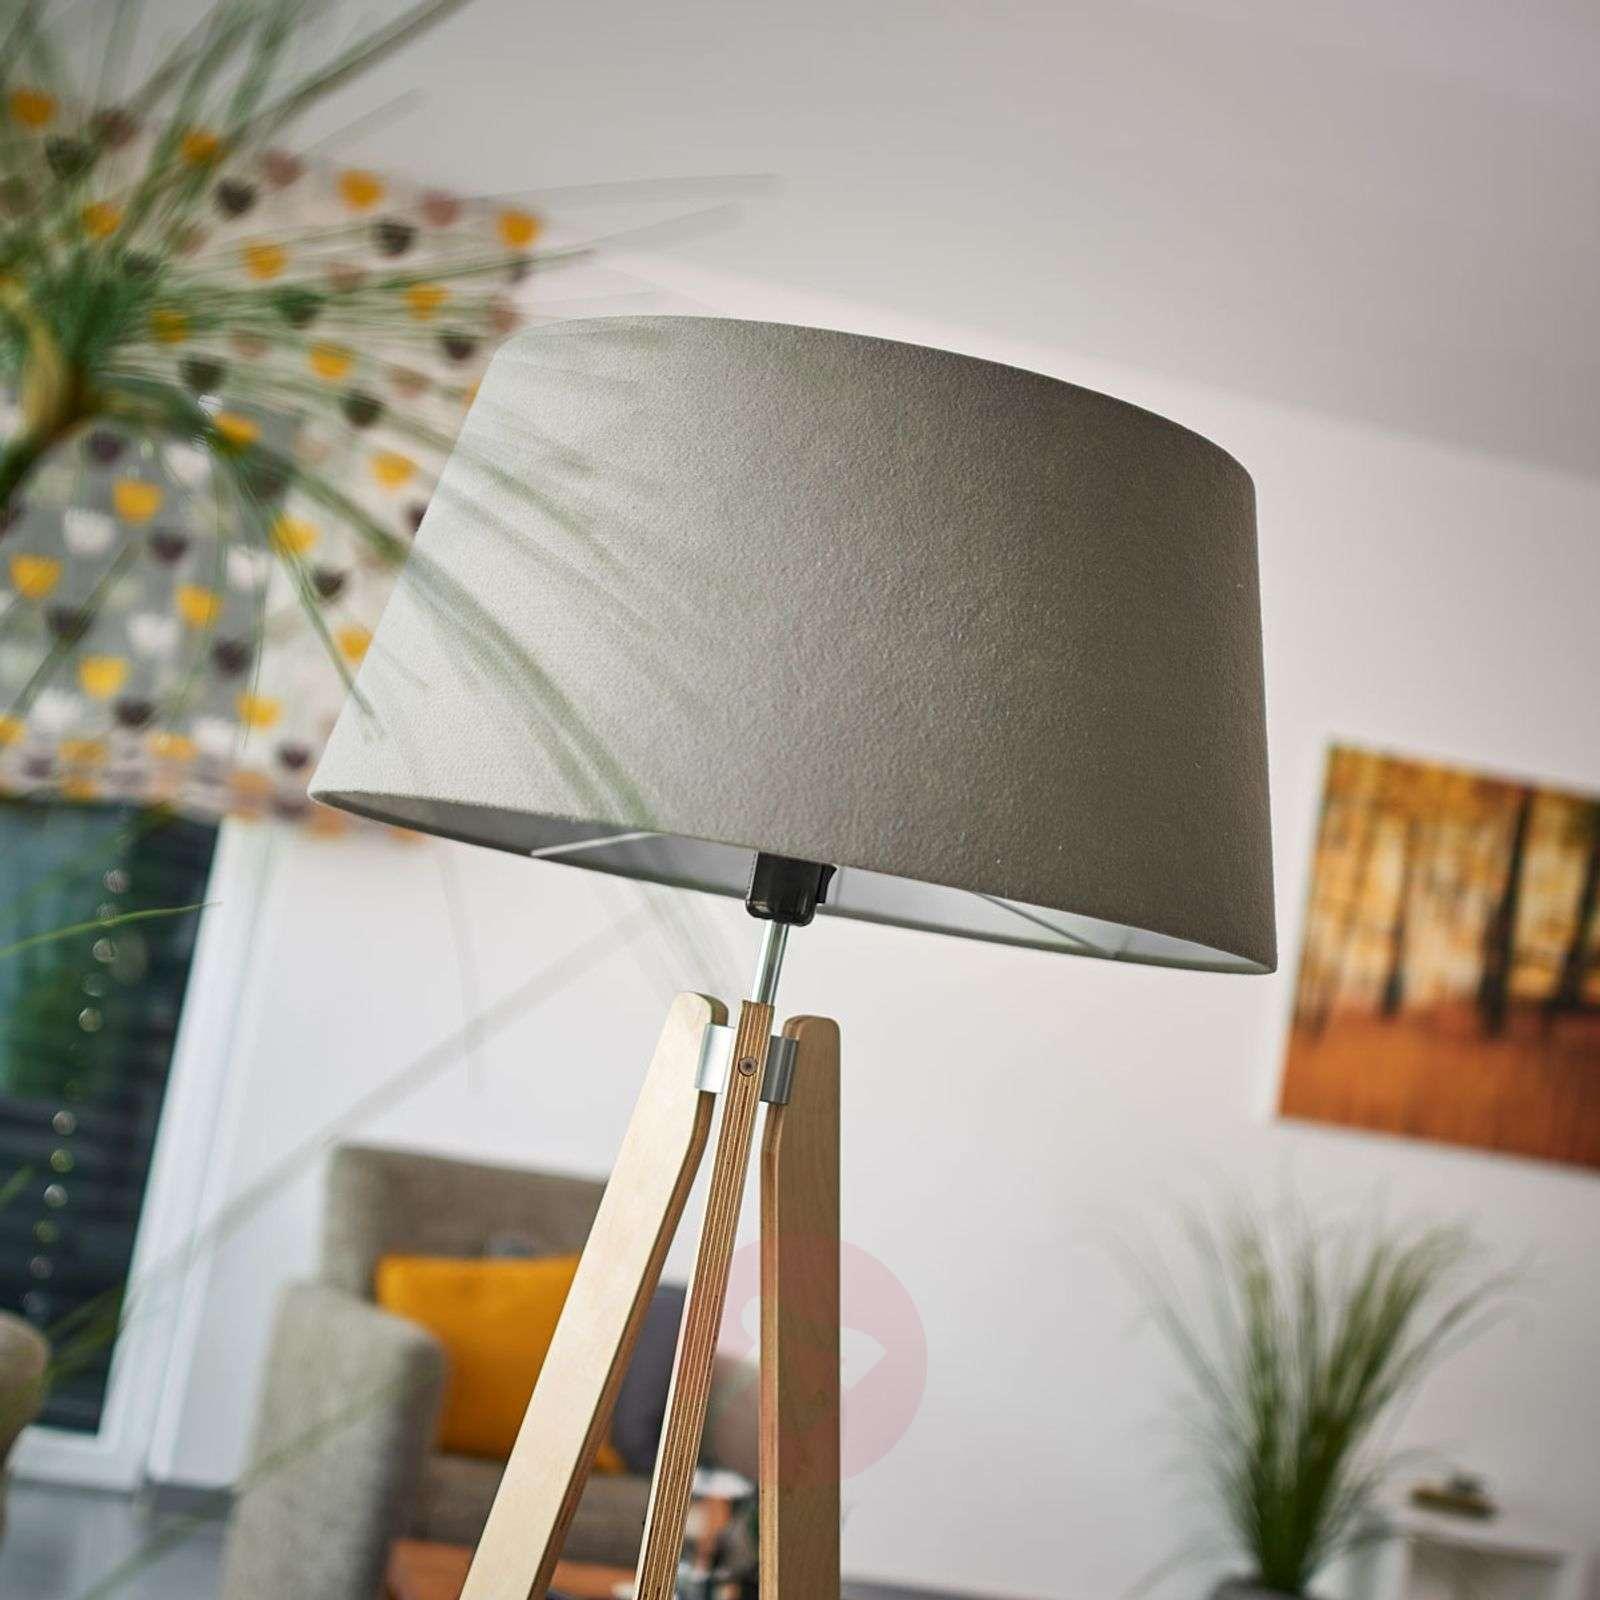 With grey felt lampshade Thea wooden floor lamp-6722430-01